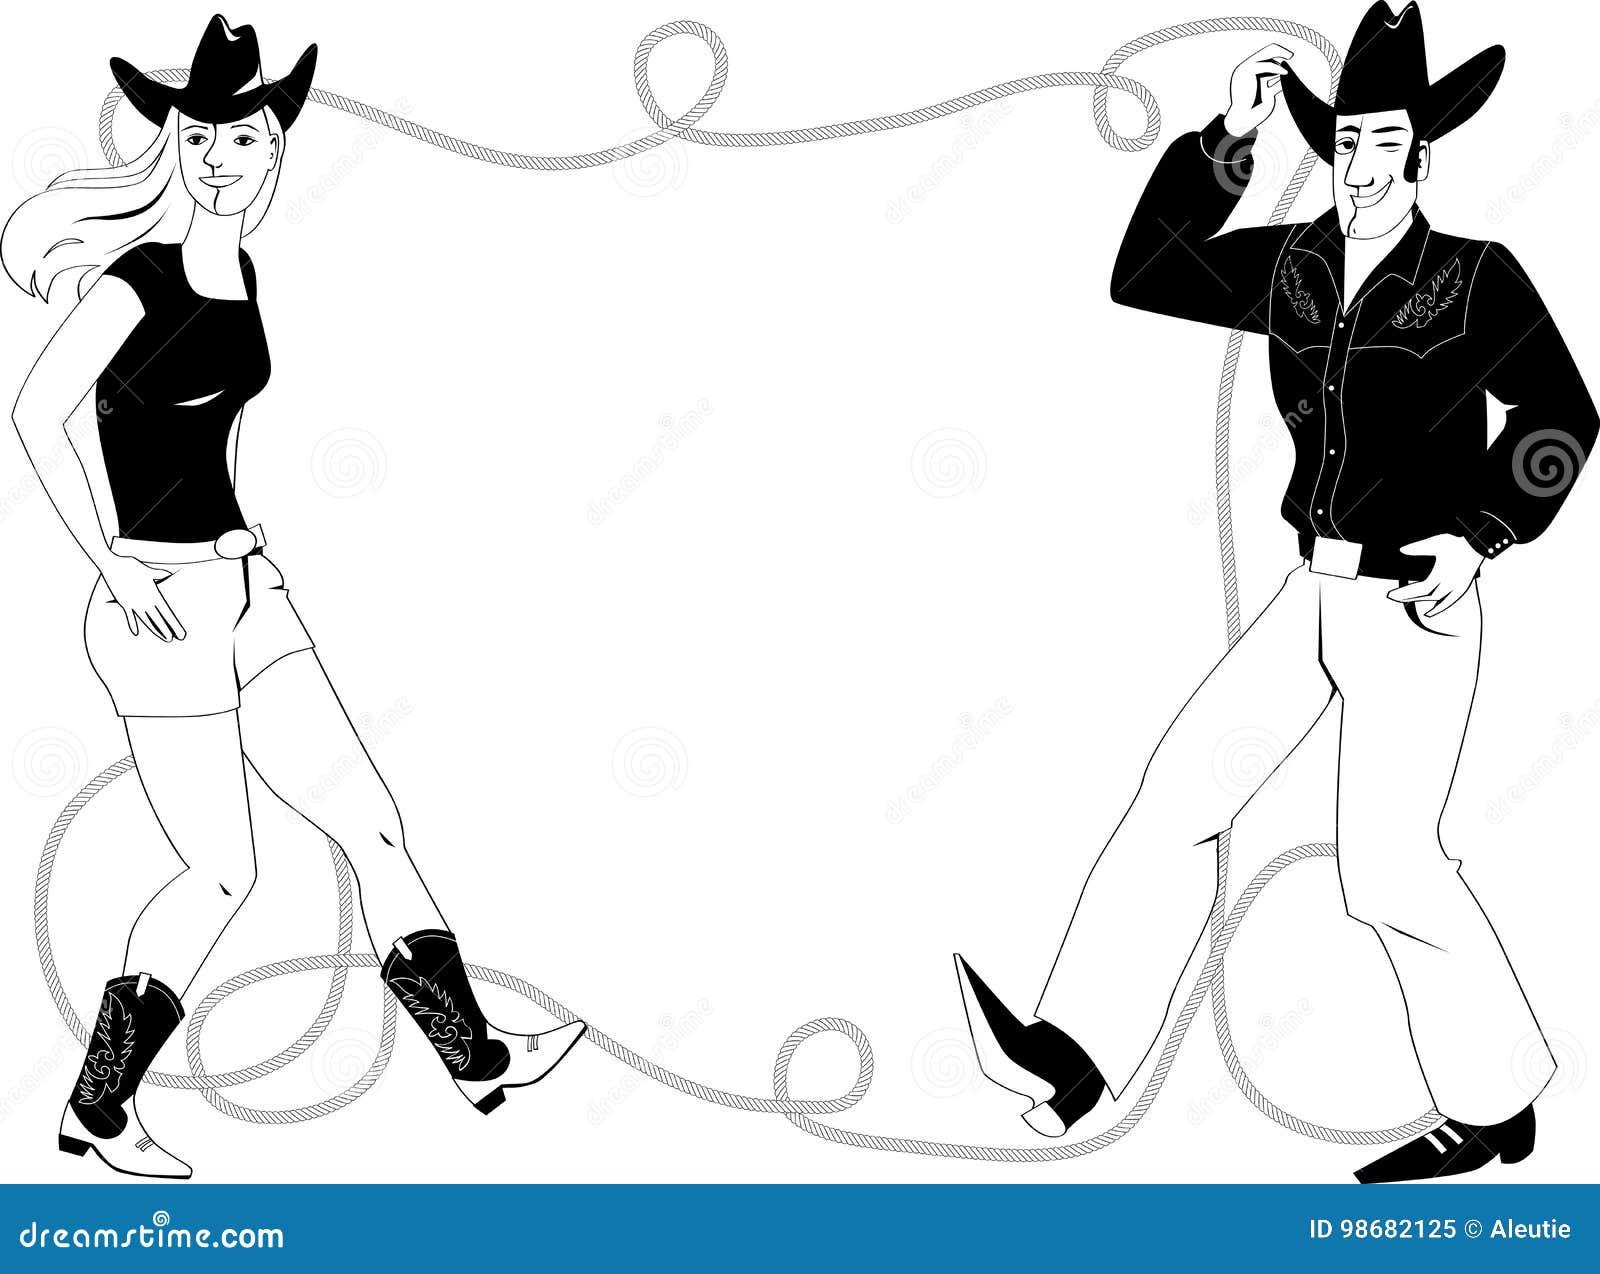 Line dance frame stock vector. Illustration of folk, cowgirl - 98682125